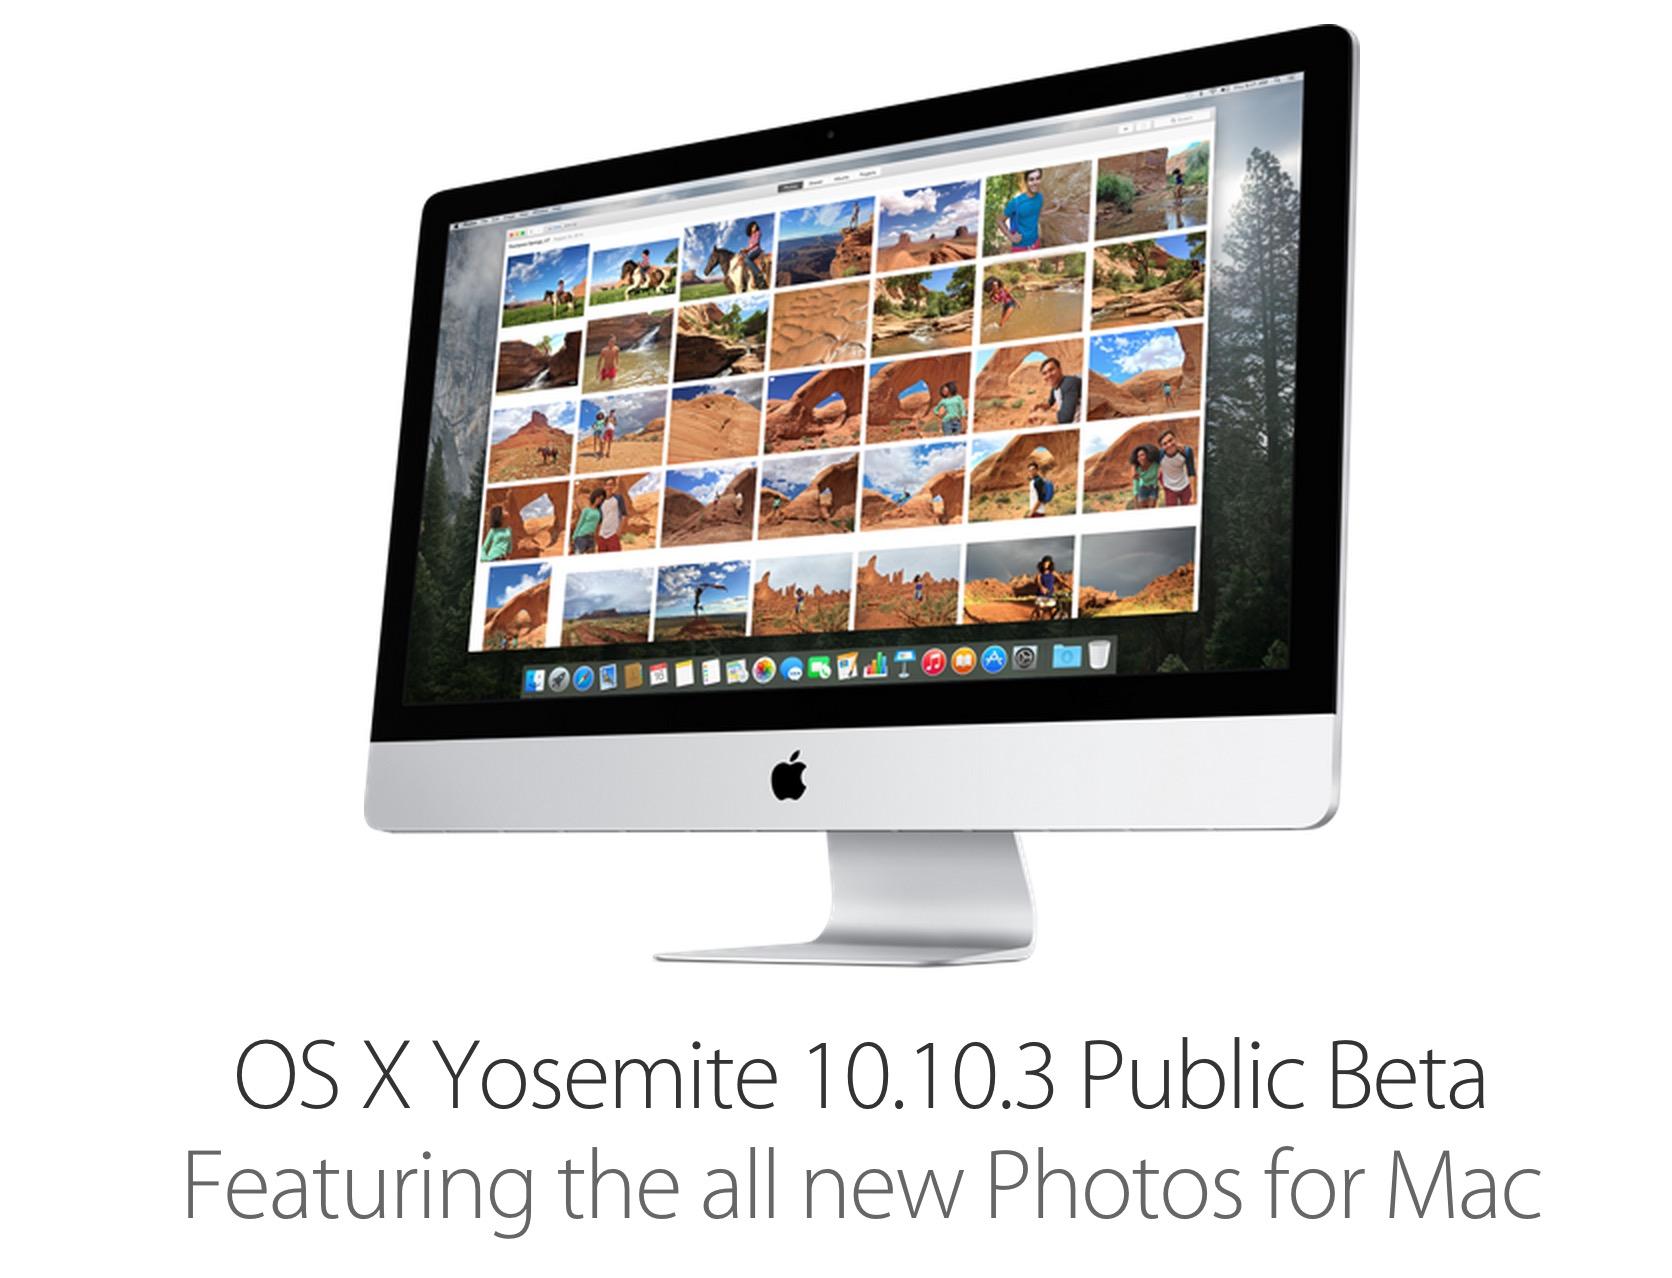 osx 10.10.3 public beta